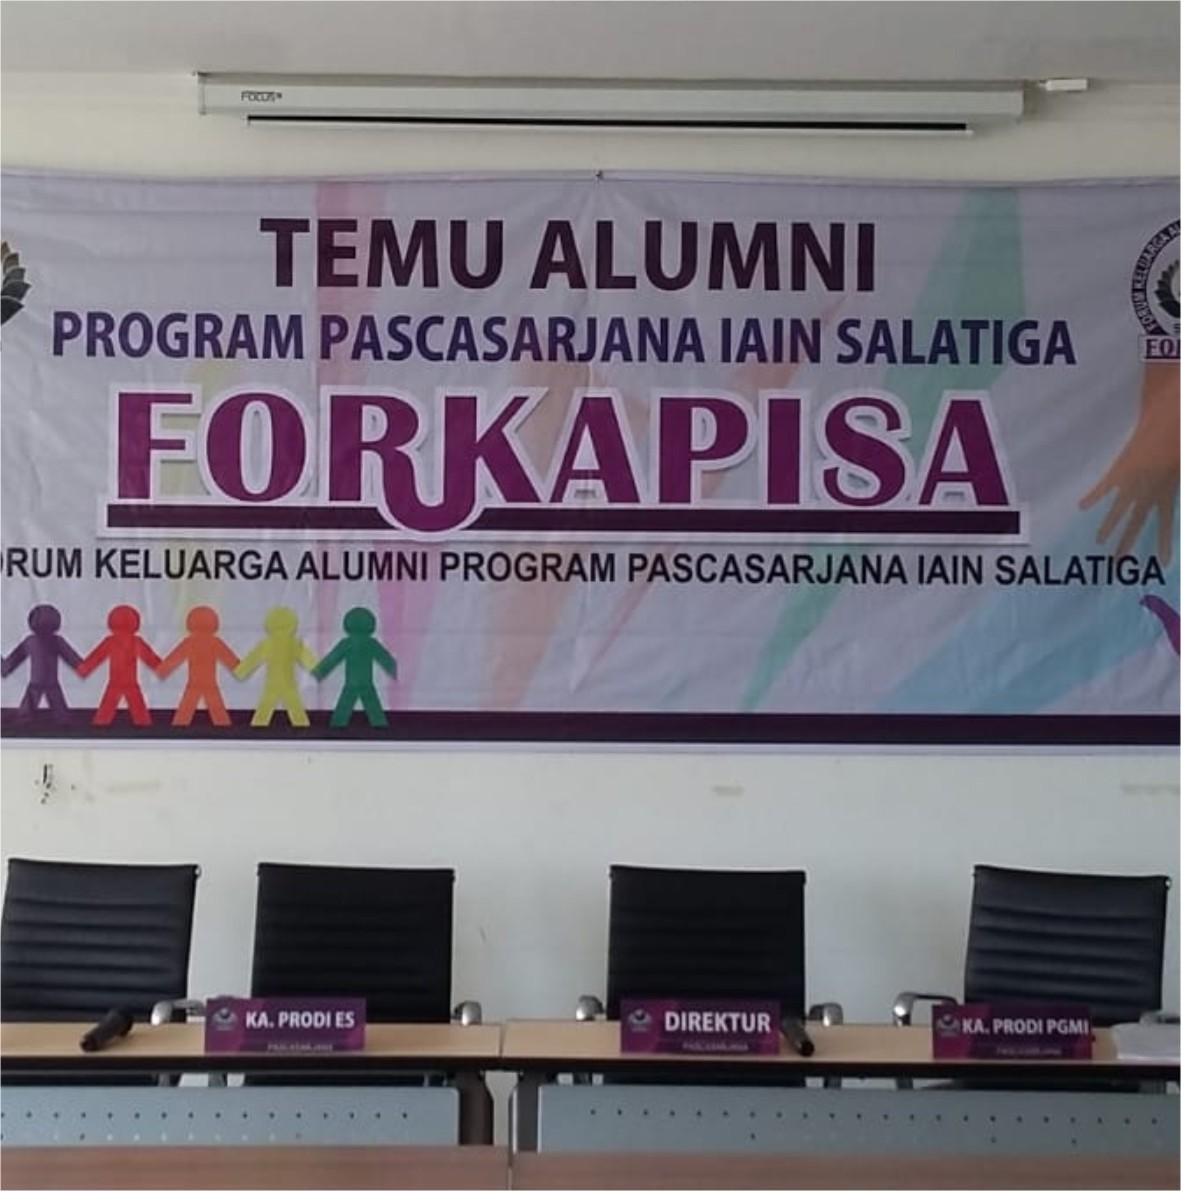 Forkapisa_Alumni_Pascasarjana_IAIN Salatiga